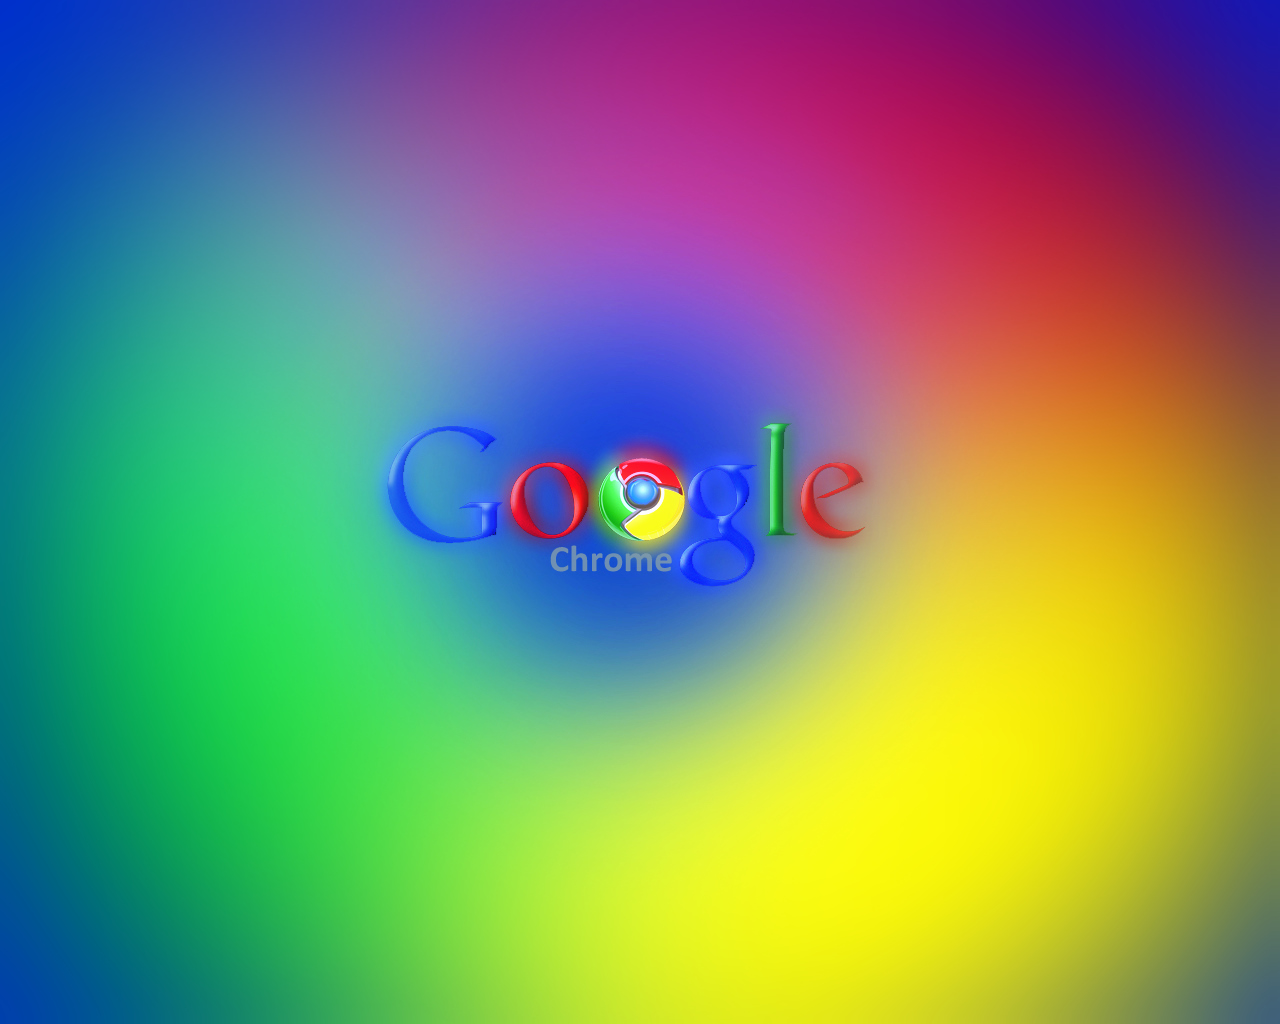 Google Wallpaper Themes - WallpaperSafari